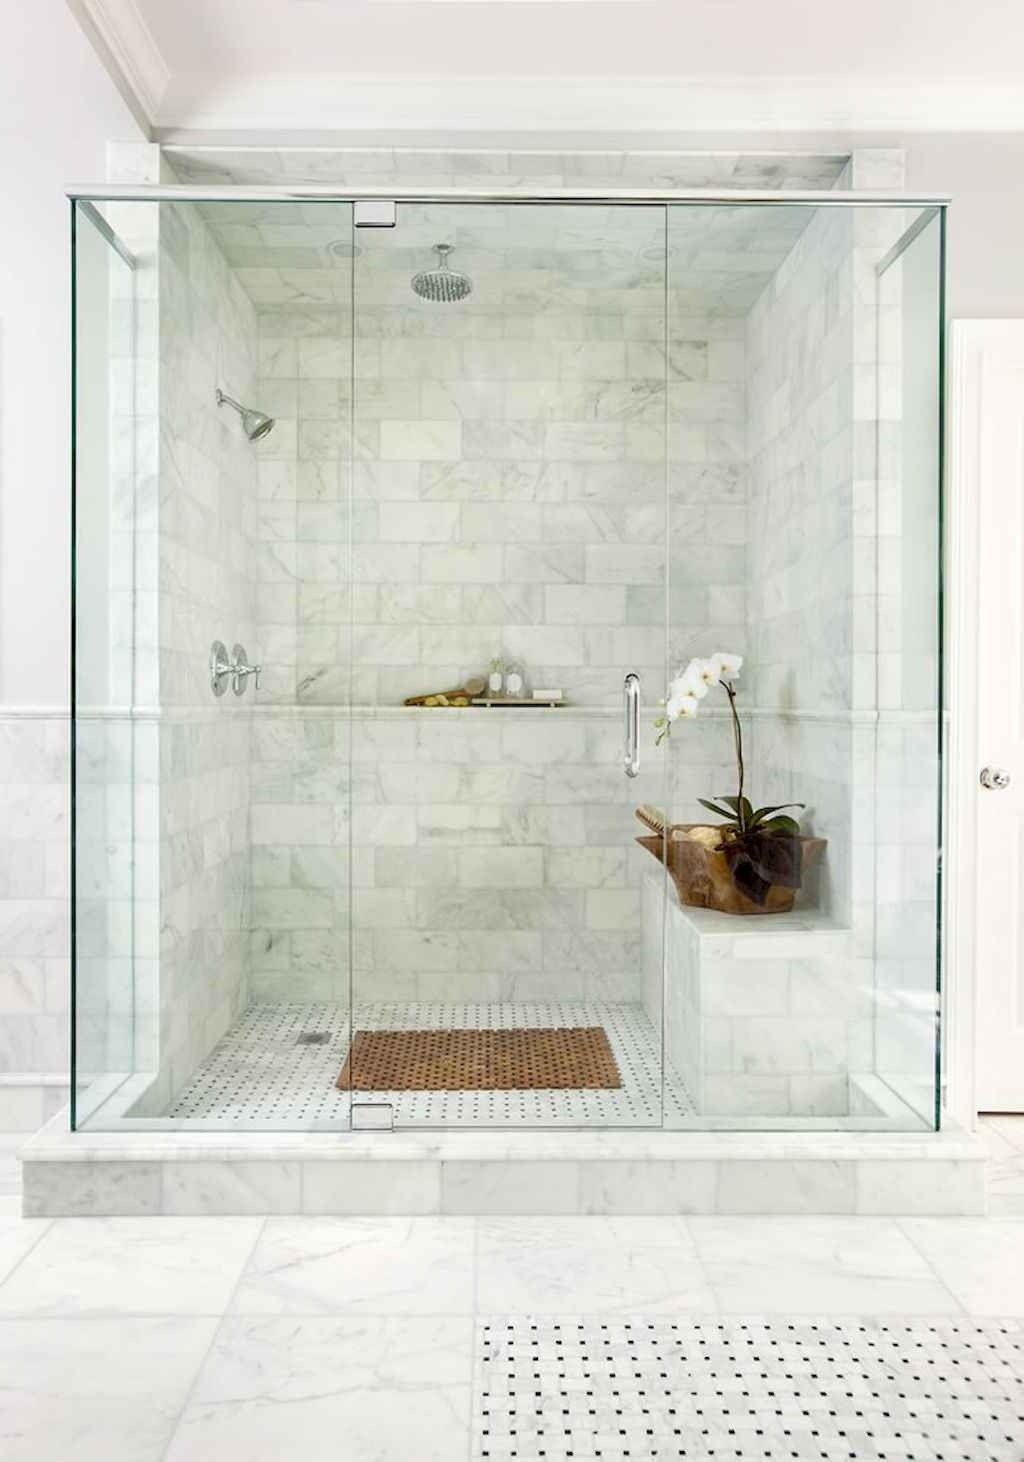 120 Stunning Bathroom Tile Shower Ideas In 2020 Small Bathroom Remodel Bathroom Remodel Master Bathroom Shower Tile